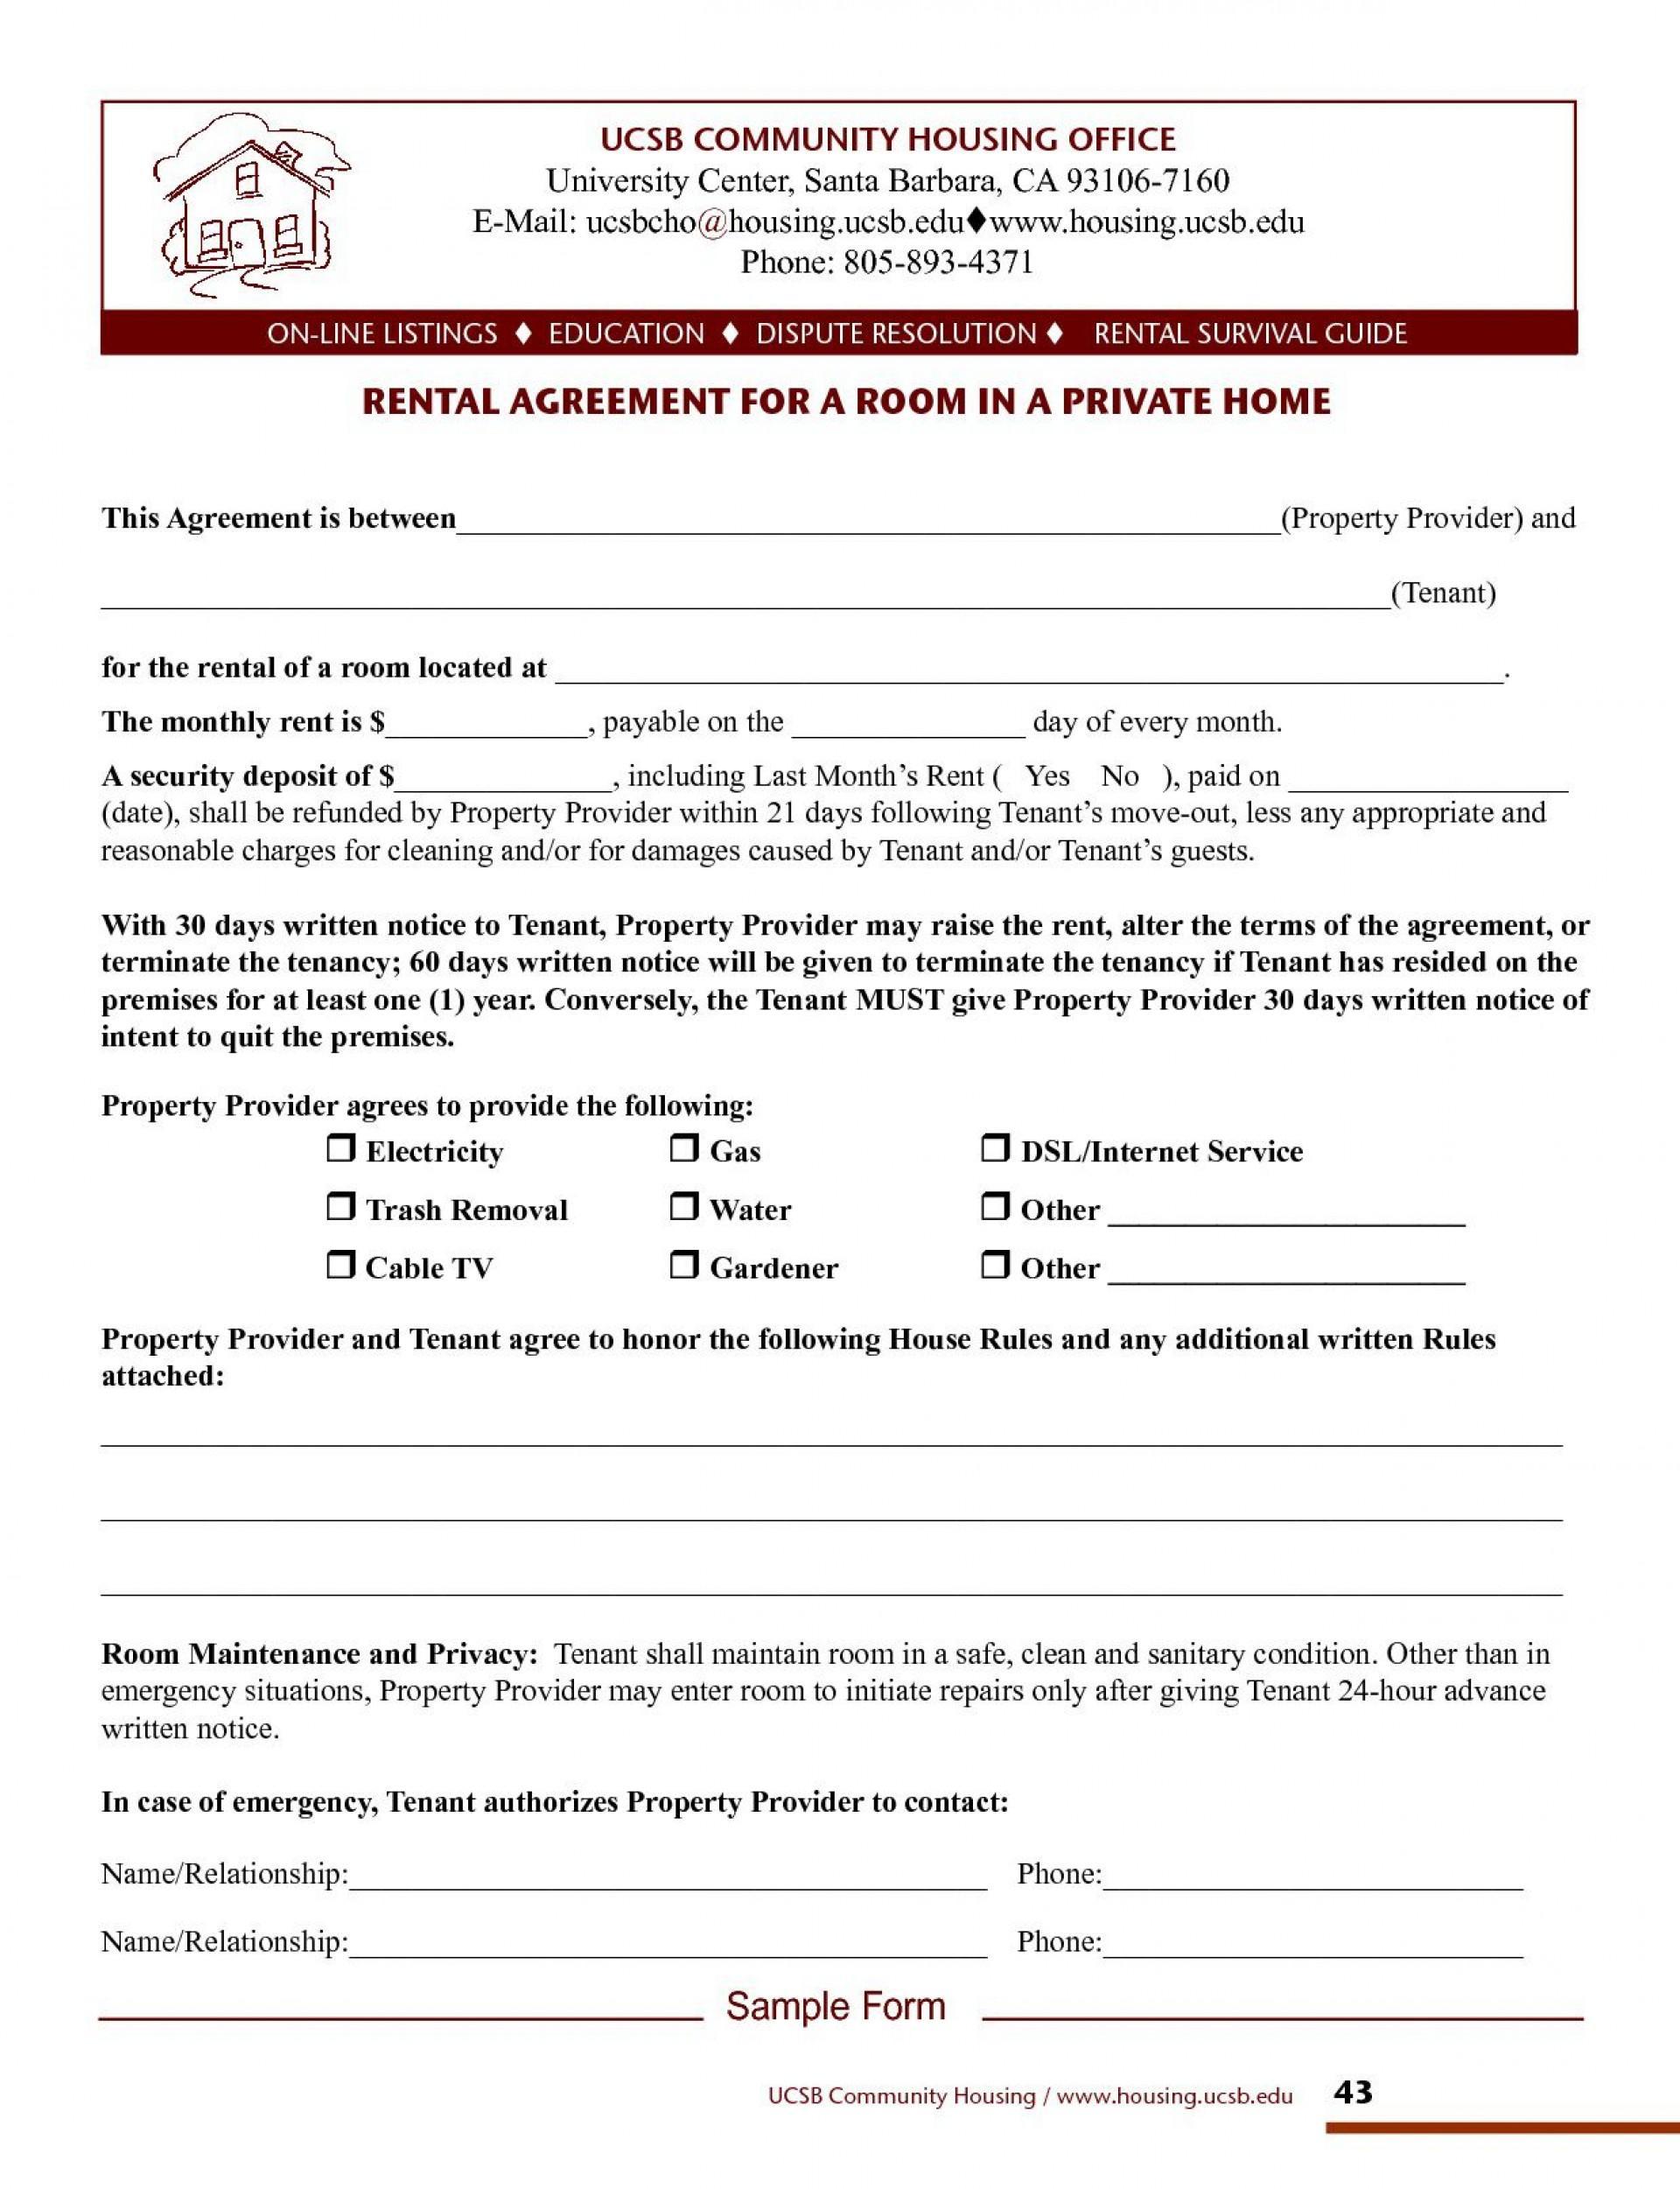 003 Sensational House Rental Agreement Template Inspiration  Home Free Ireland Form1920